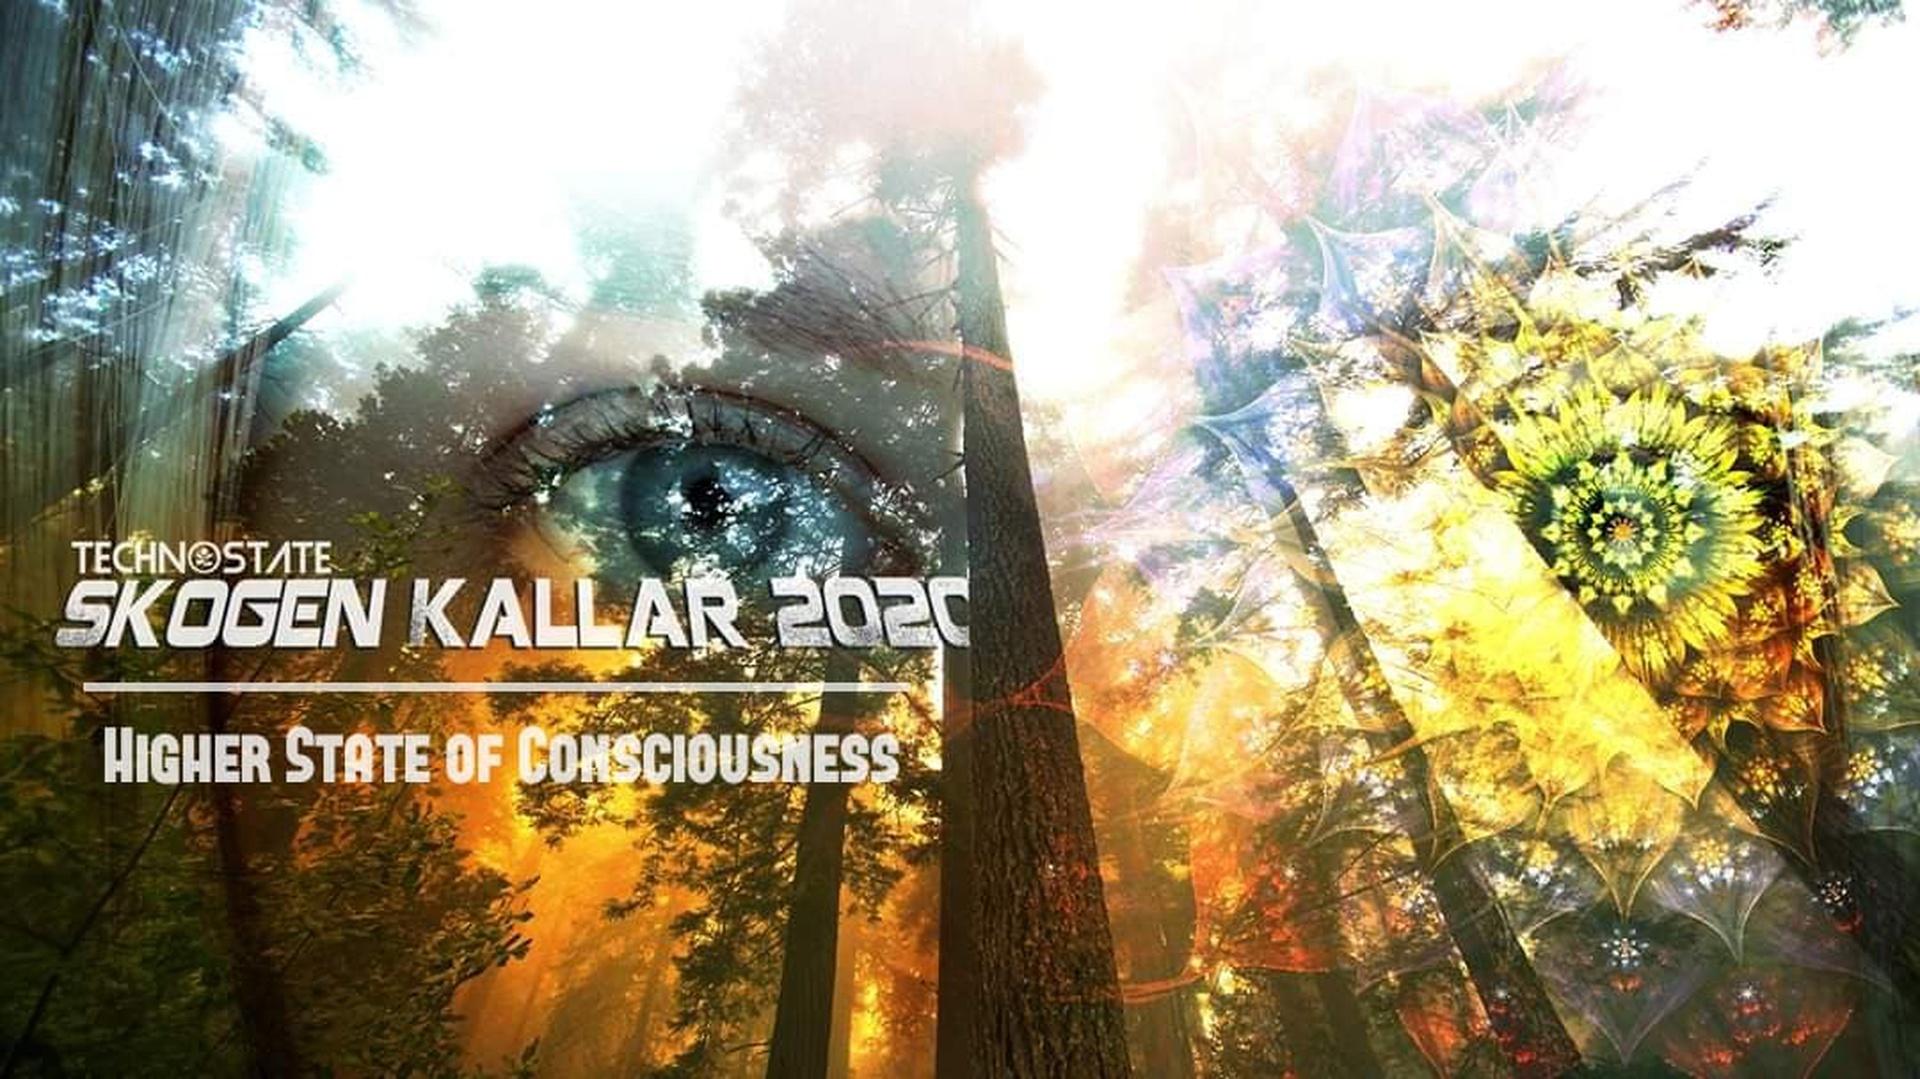 Event: Skogen Kallar 2020